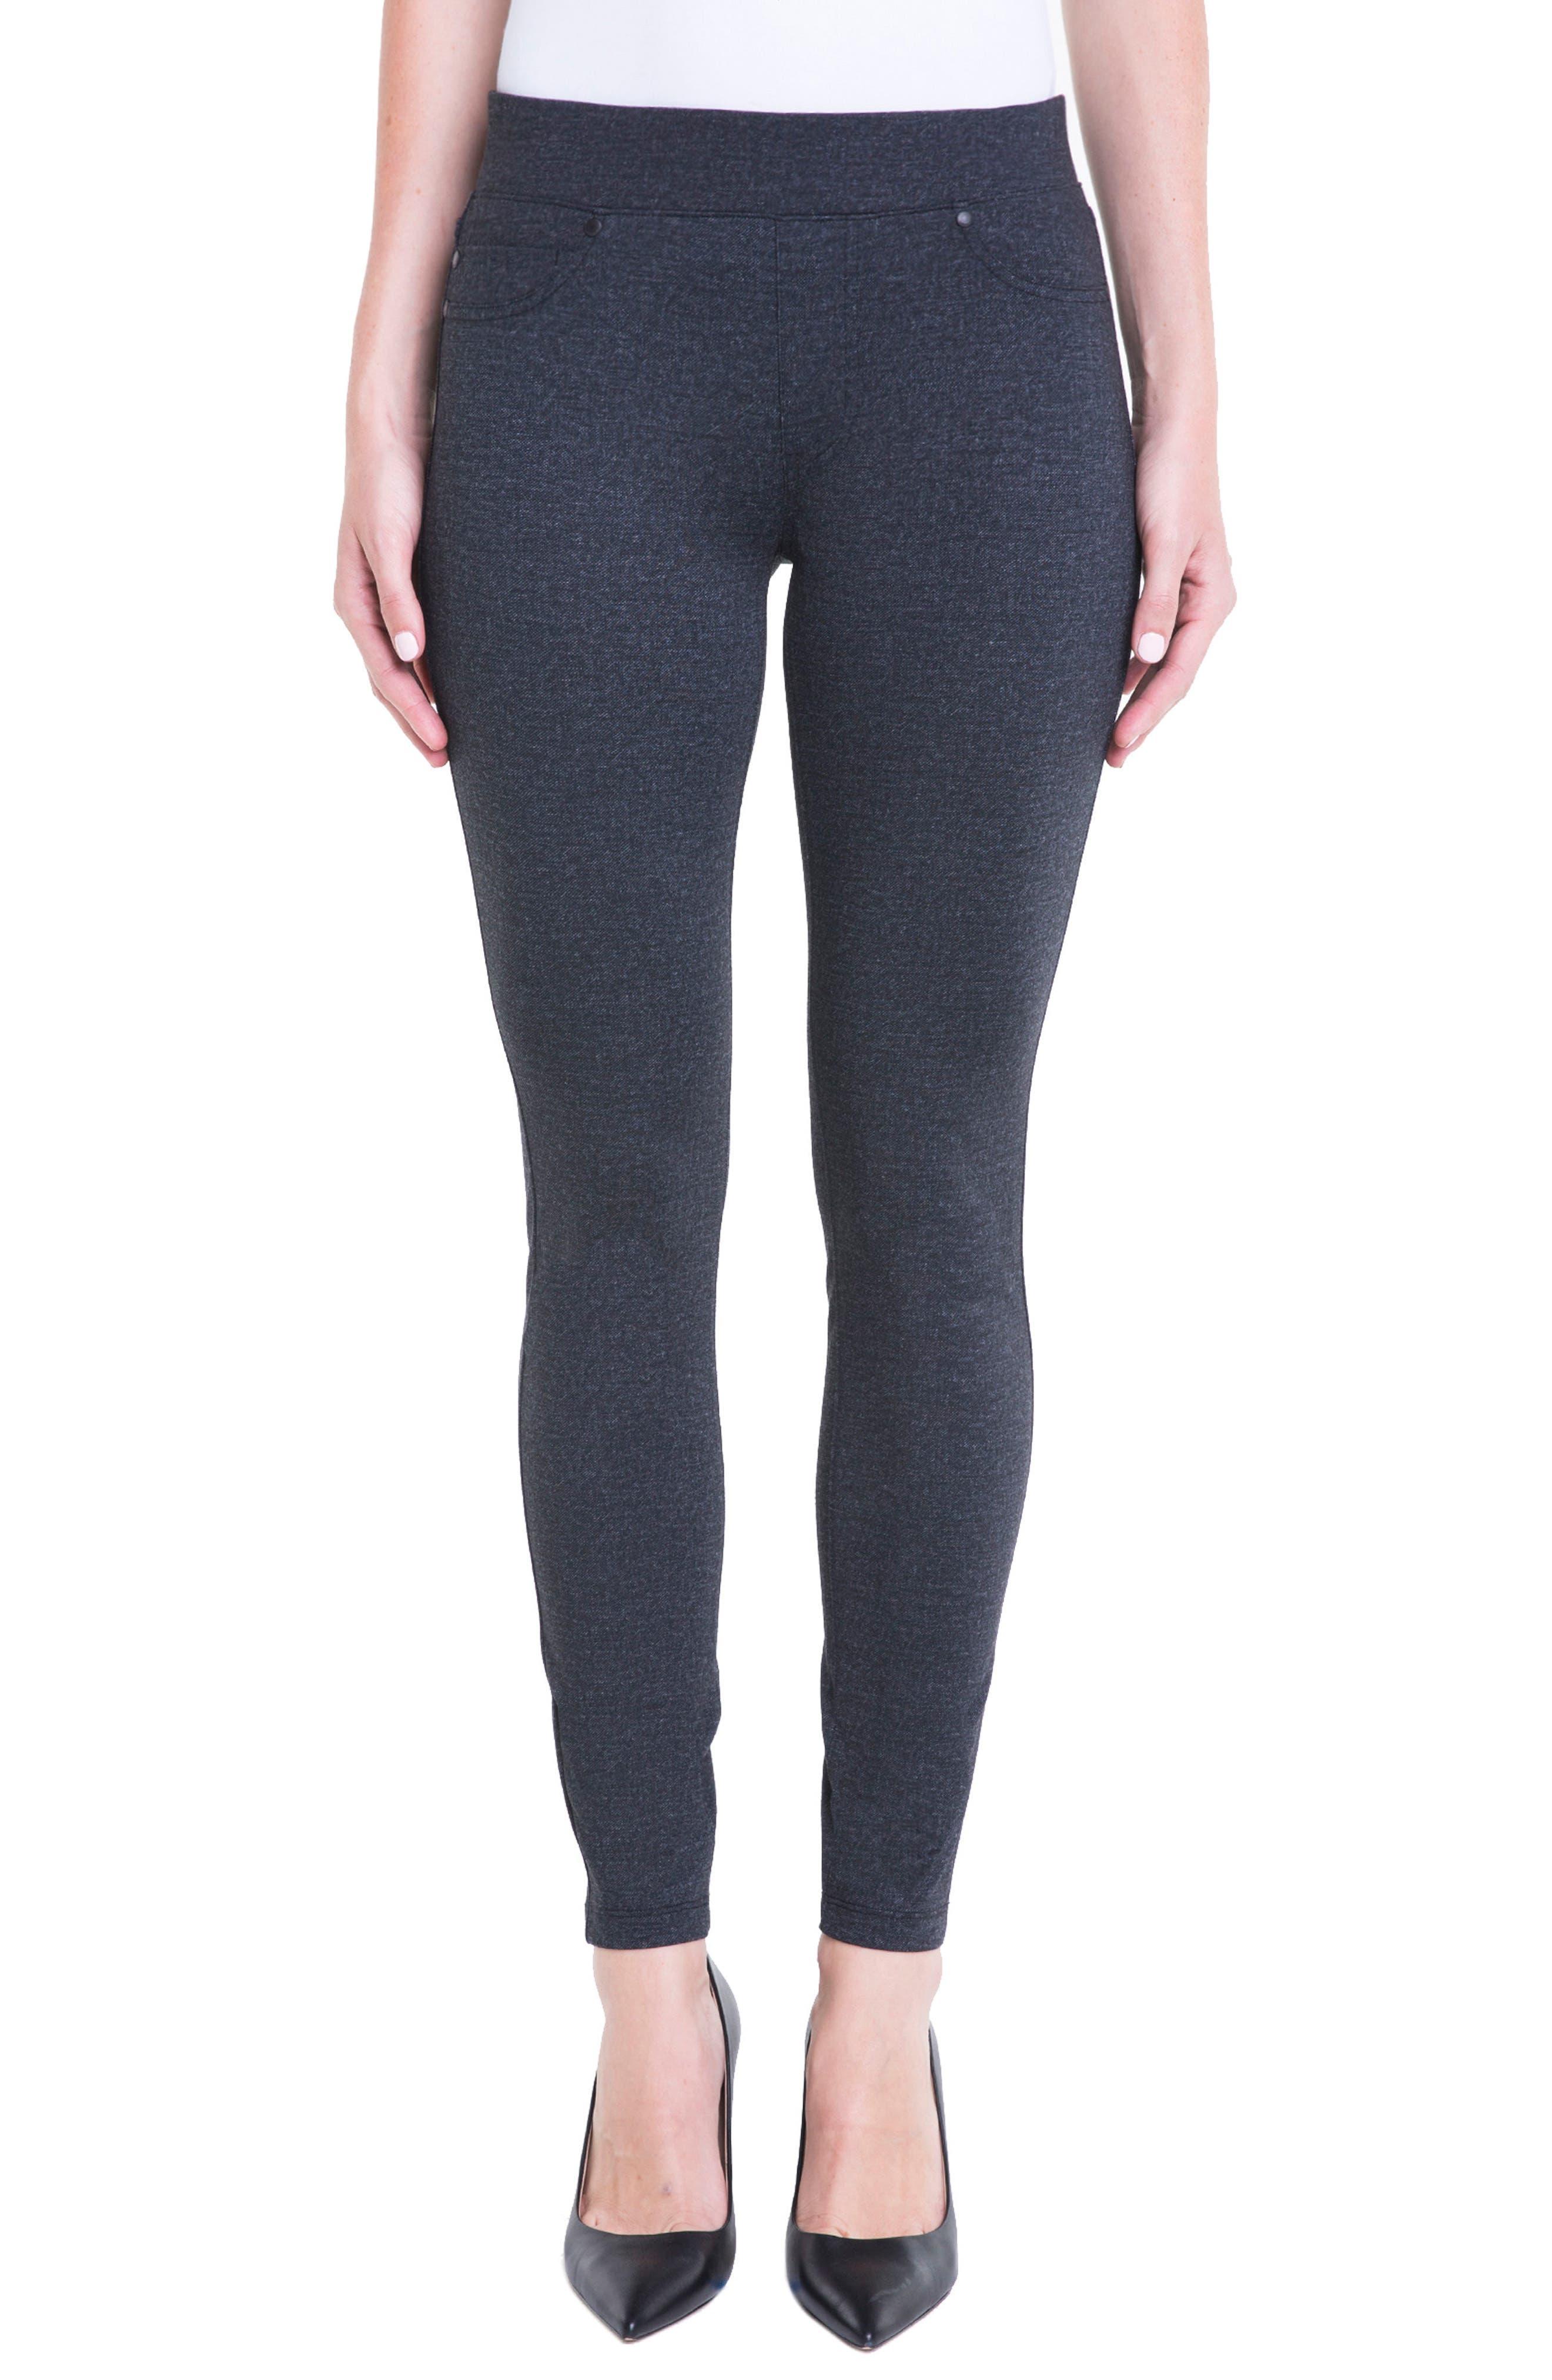 Main Image - Liverpool Jeans Company Sienna Denim Knit Leggings